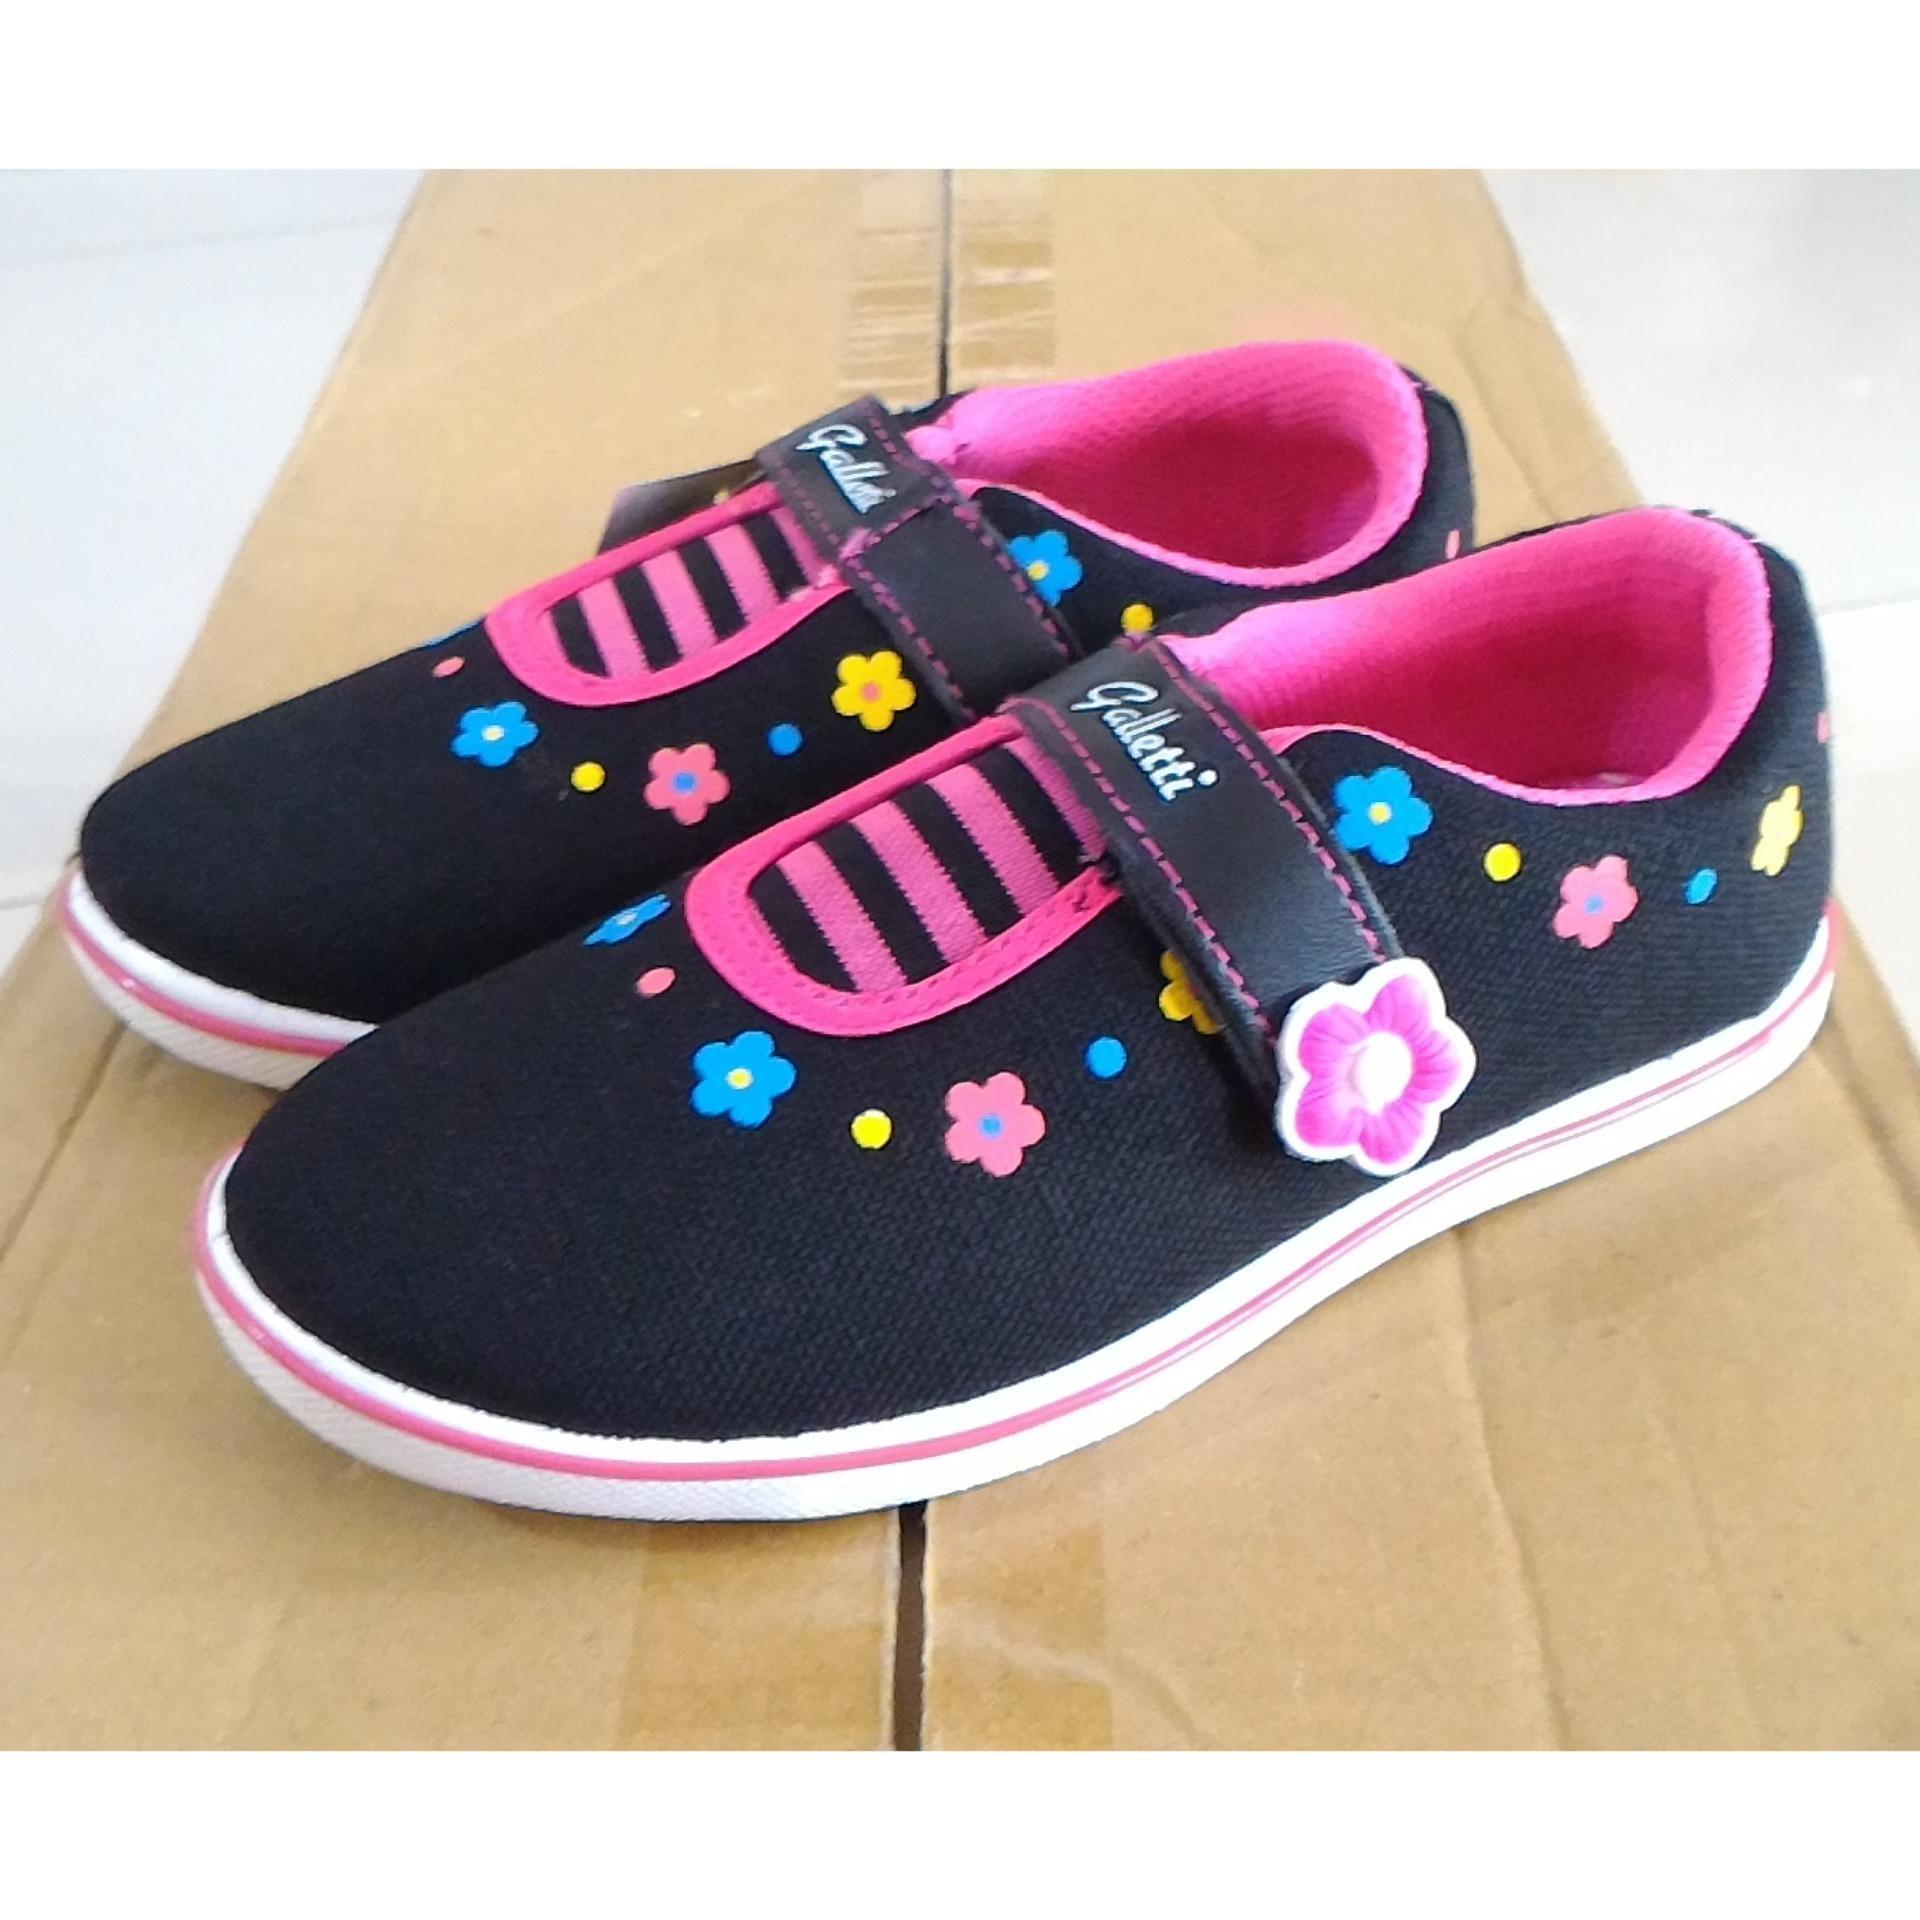 Jual Fanie Shoes Galletti Sepatu Sekolah Hitam Anak Perempuan Cantik Murah Fashion Murah